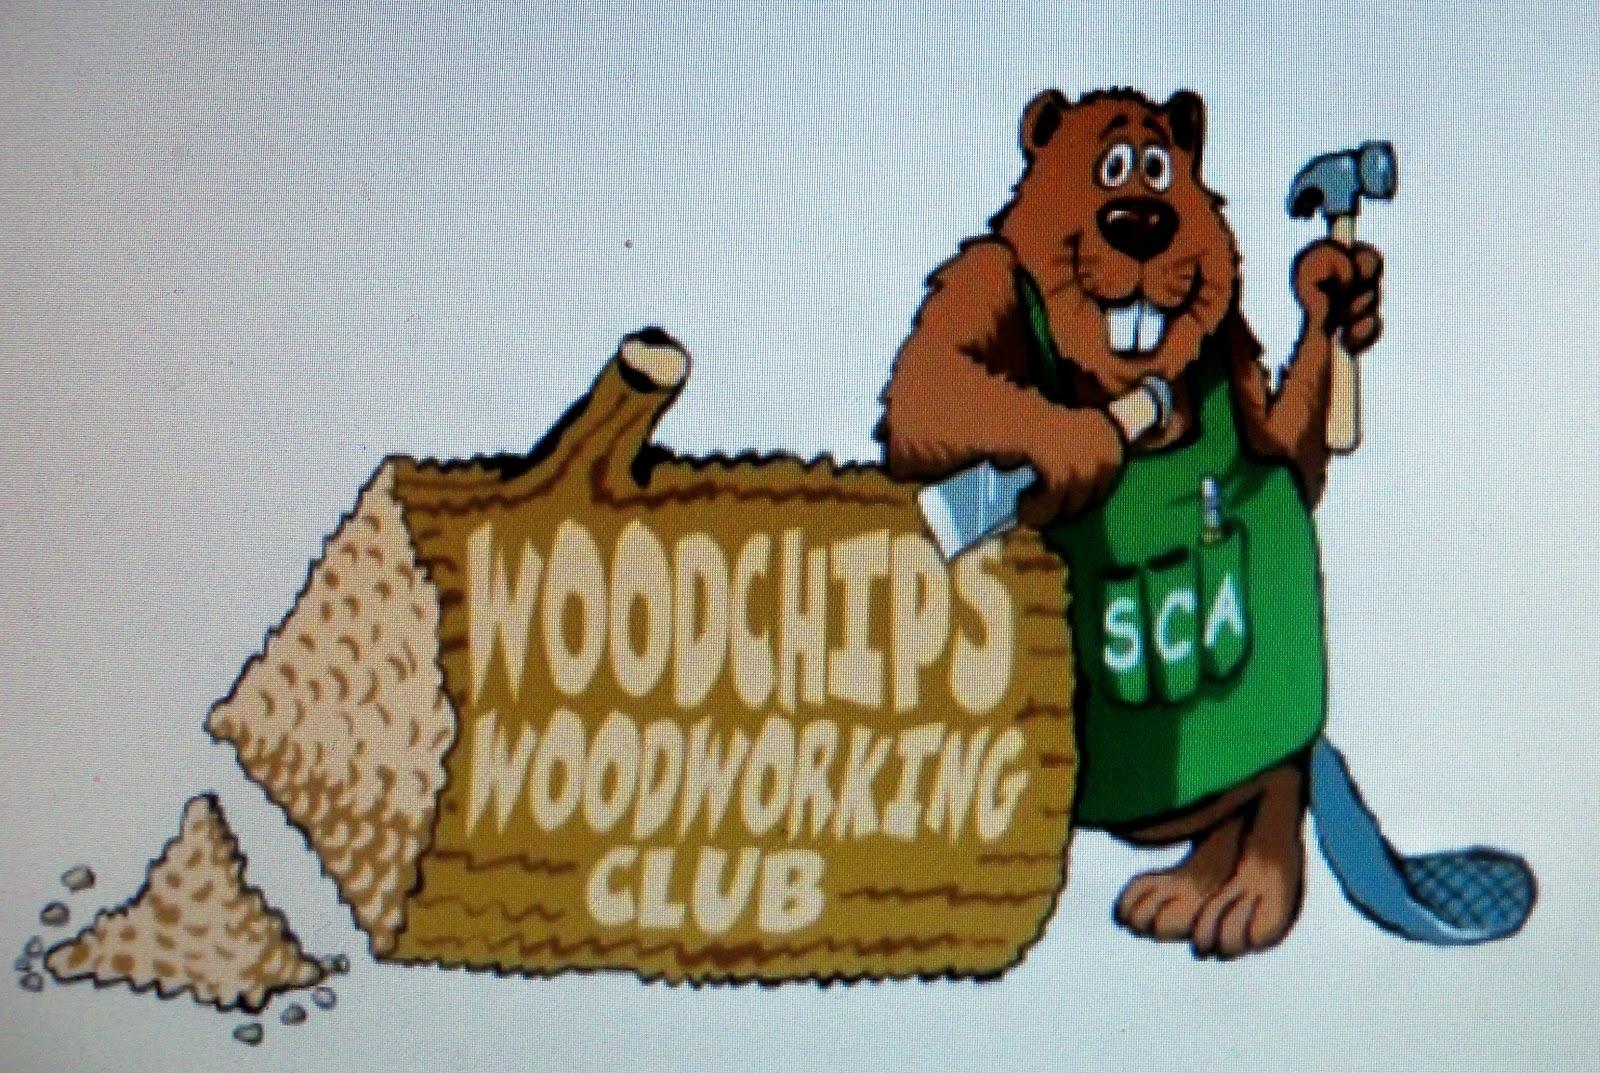 Woodchips---Logo+%281%29.jpg (1600×1073)